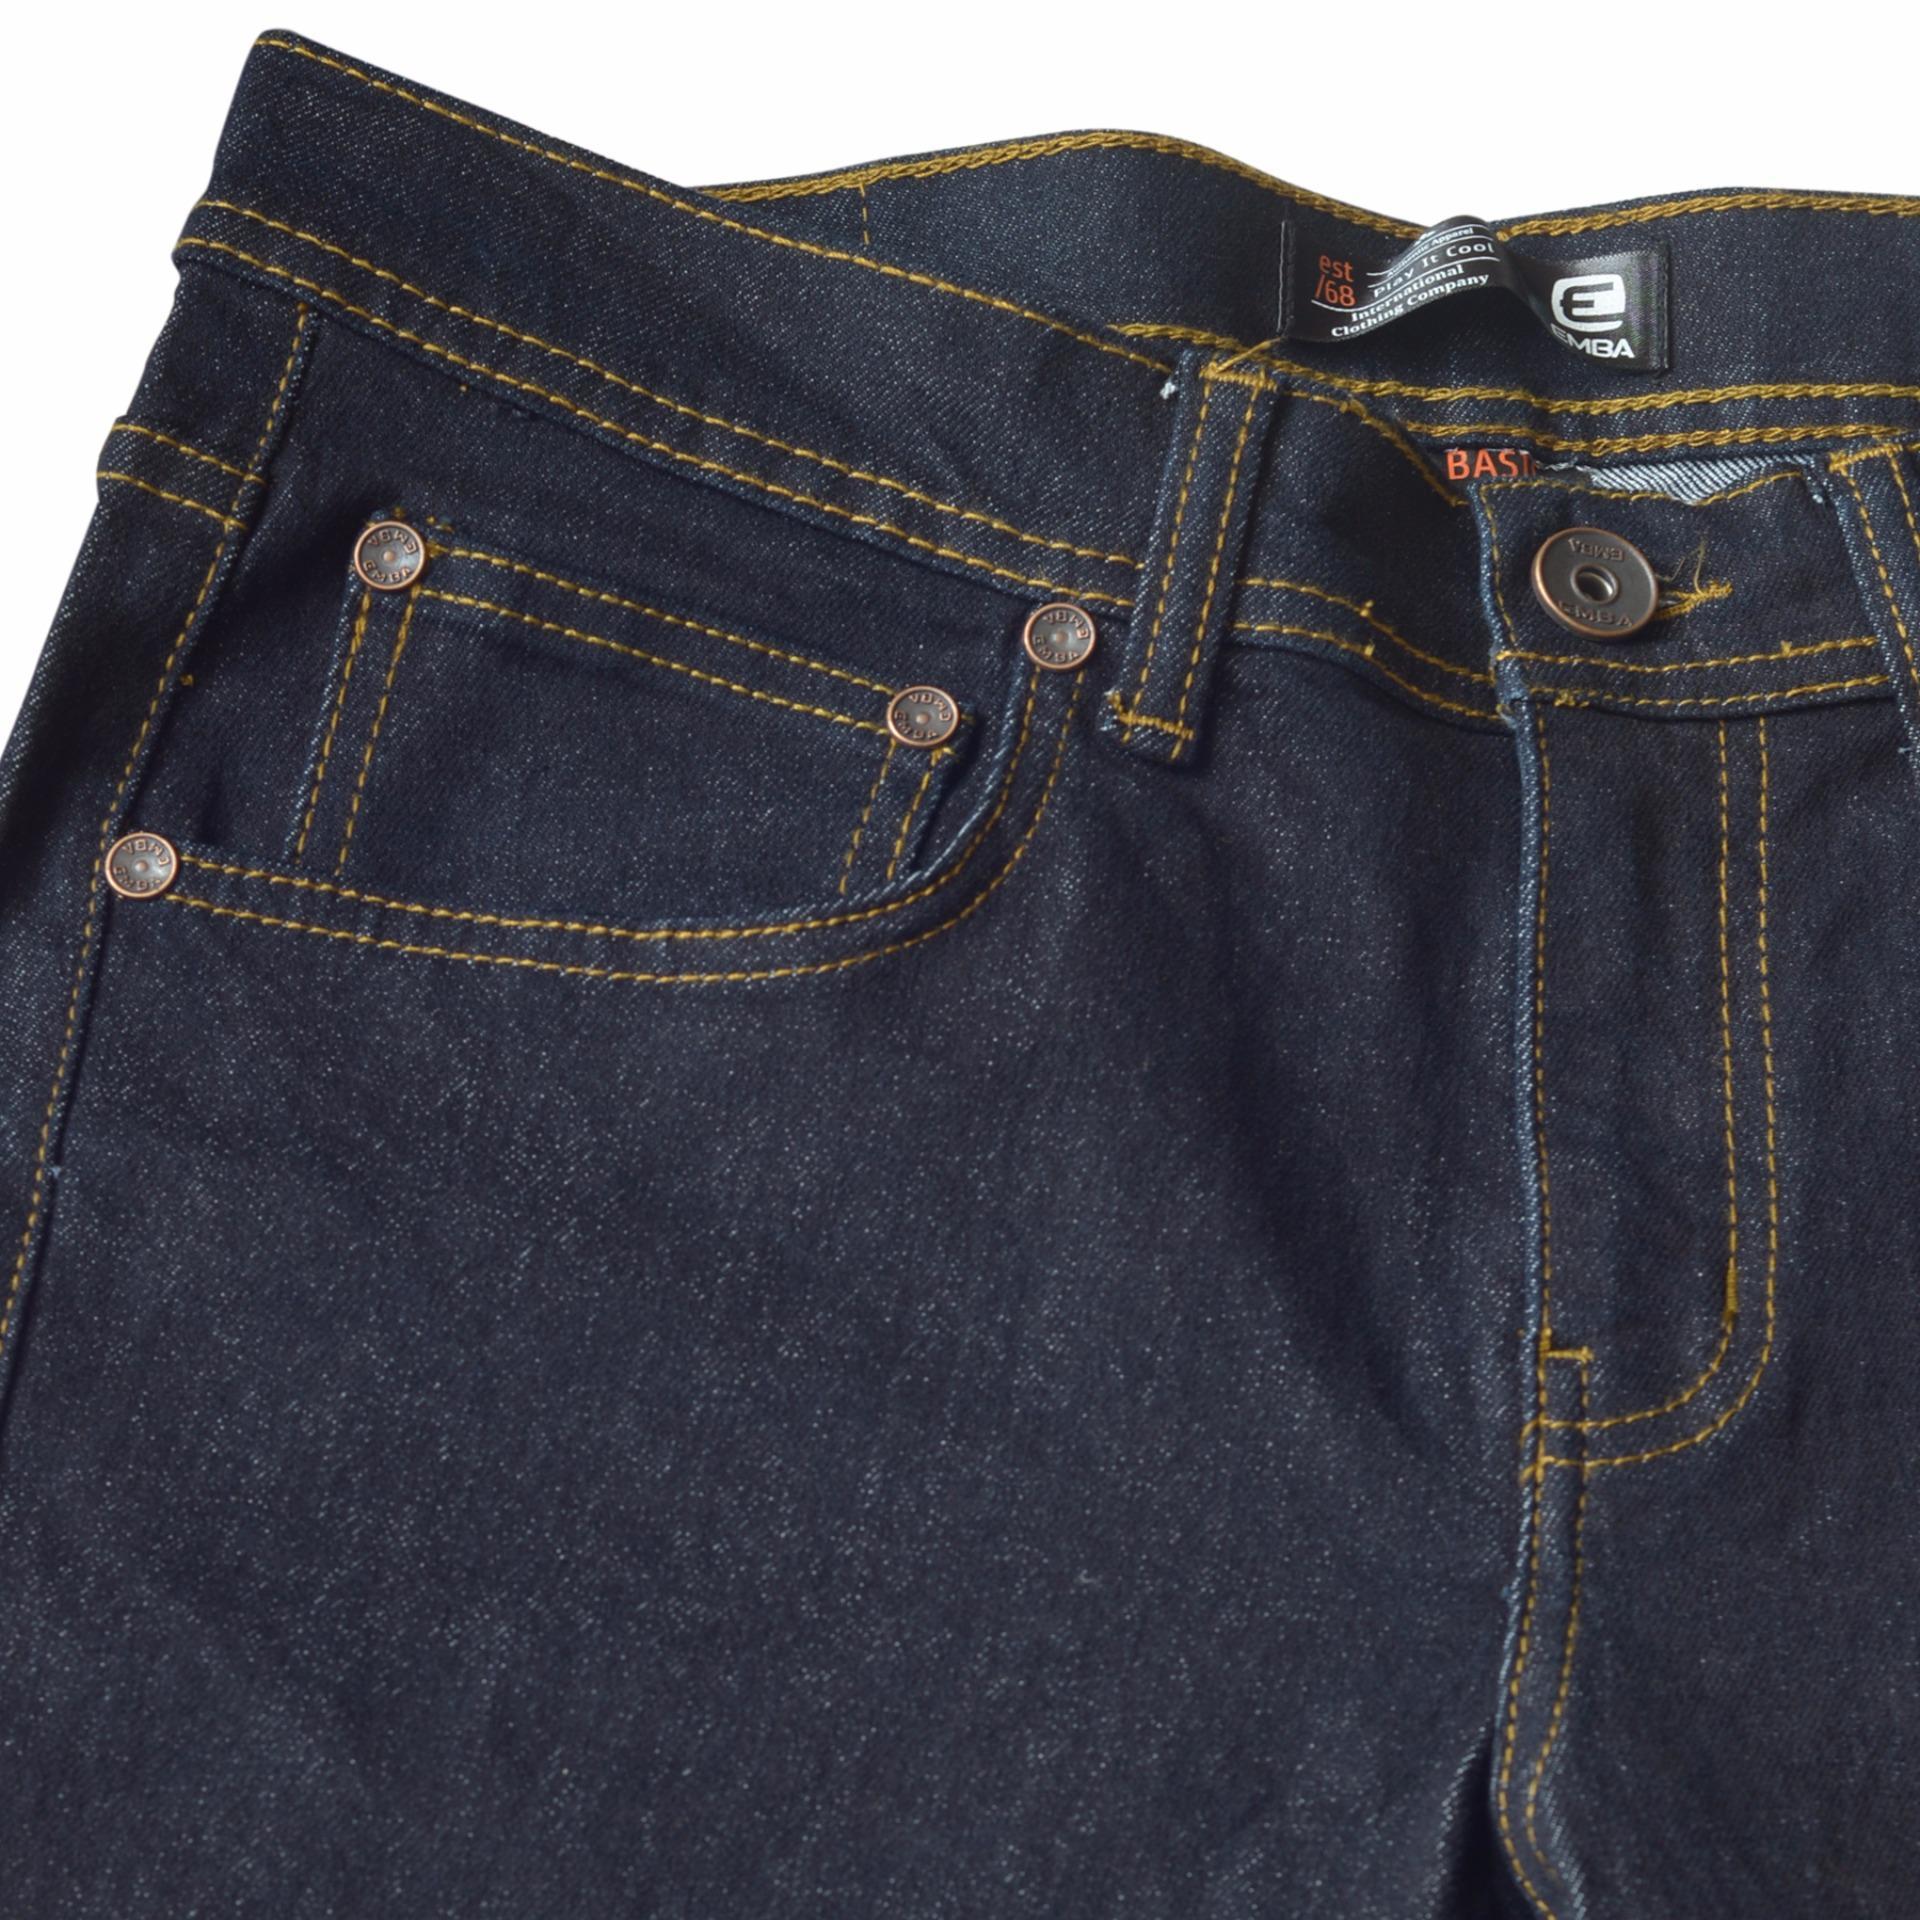 Emba Jeans Celana Panjang Pria Bs 081 Jordan Regular 61810901 25 Fm328 Basic Upd Warna Heavy Stom Navy 27 071 Morgan Slim Fit Garment